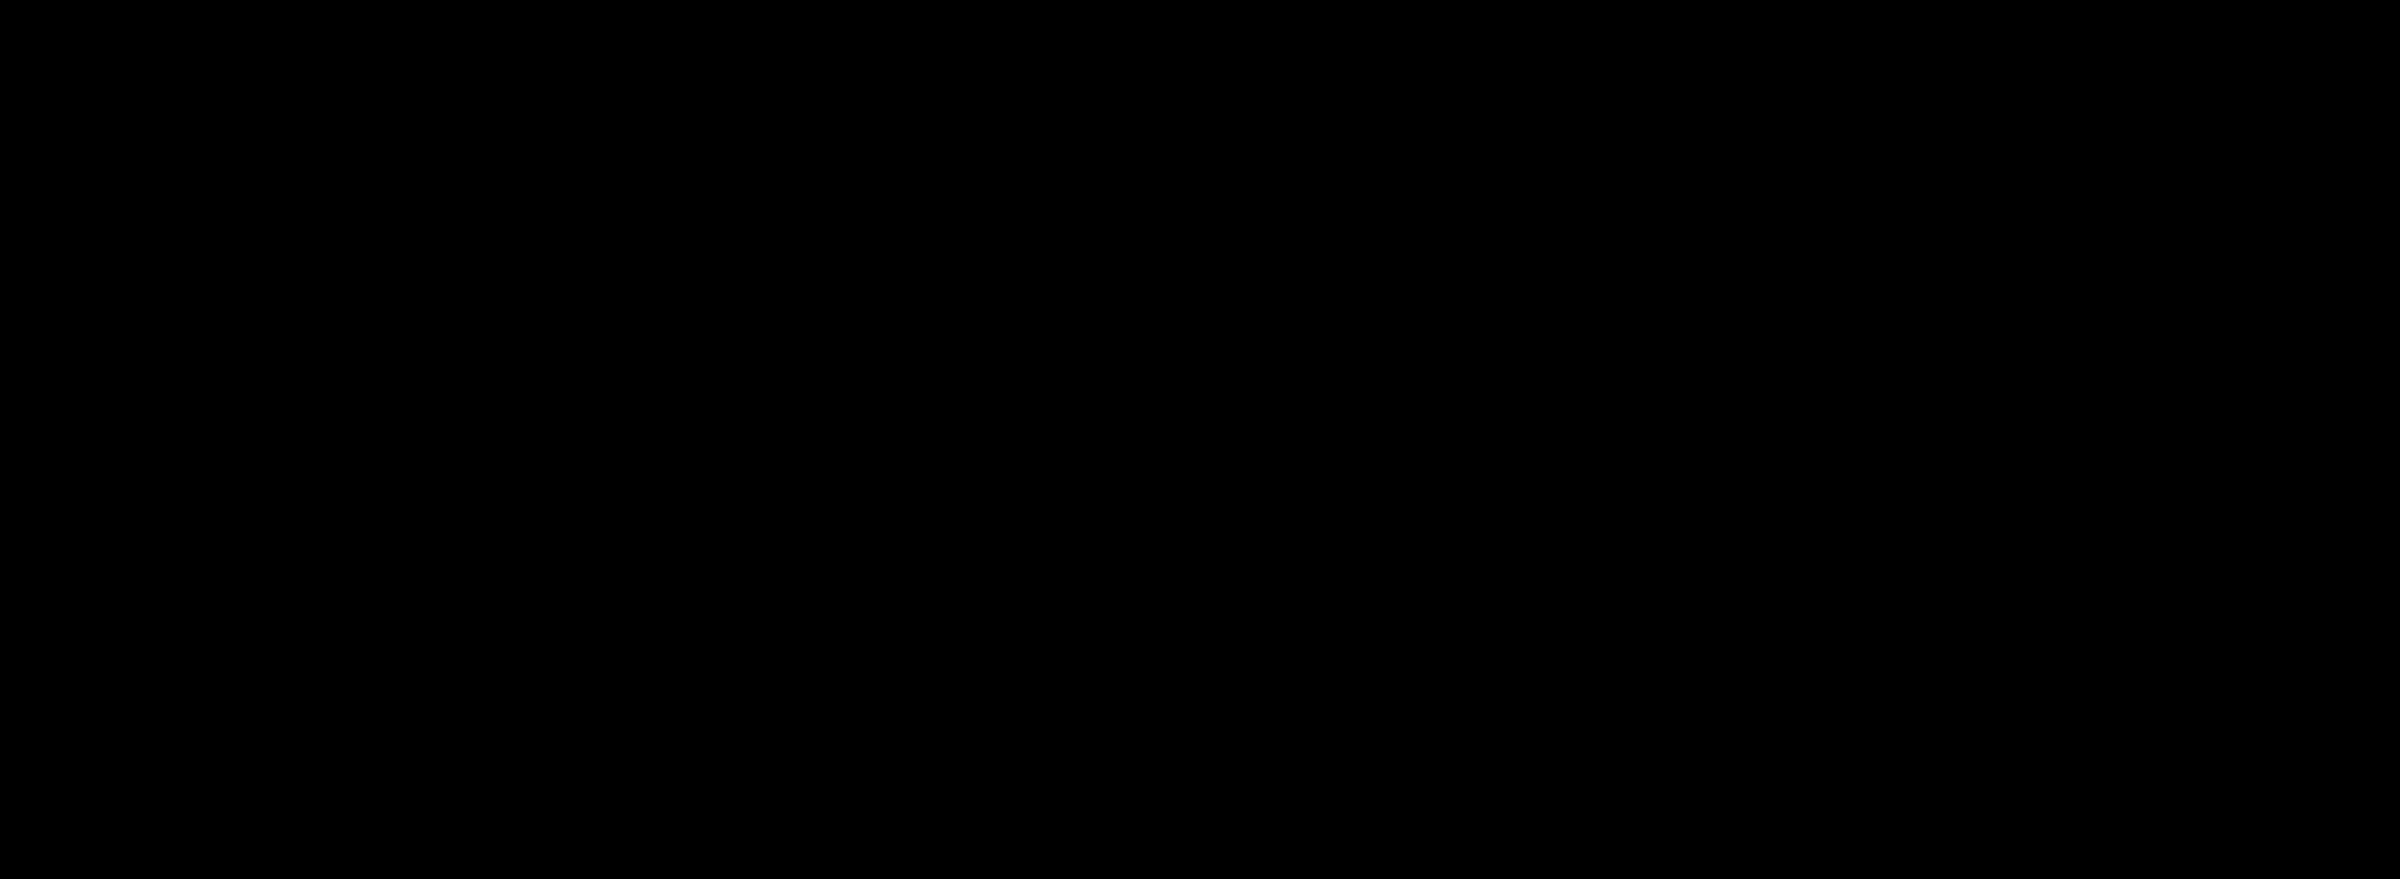 2400x879 Skeleton Key Clip Art Clipart 2